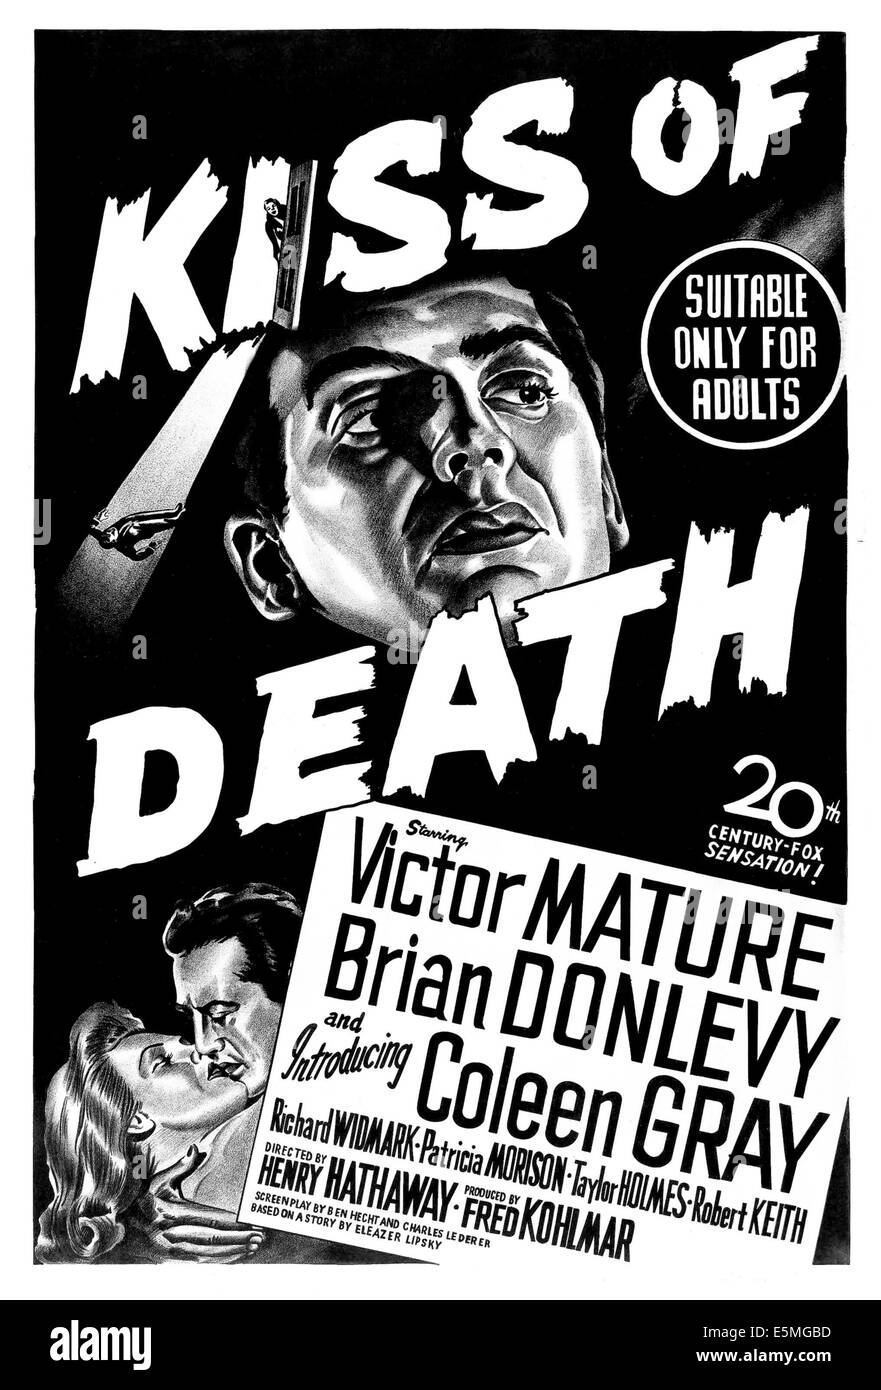 Las ultimas peliculas que has visto - Página 38 Kiss-of-death-coleen-gray-victor-mature-australian-poster-art-1947-E5MGBD